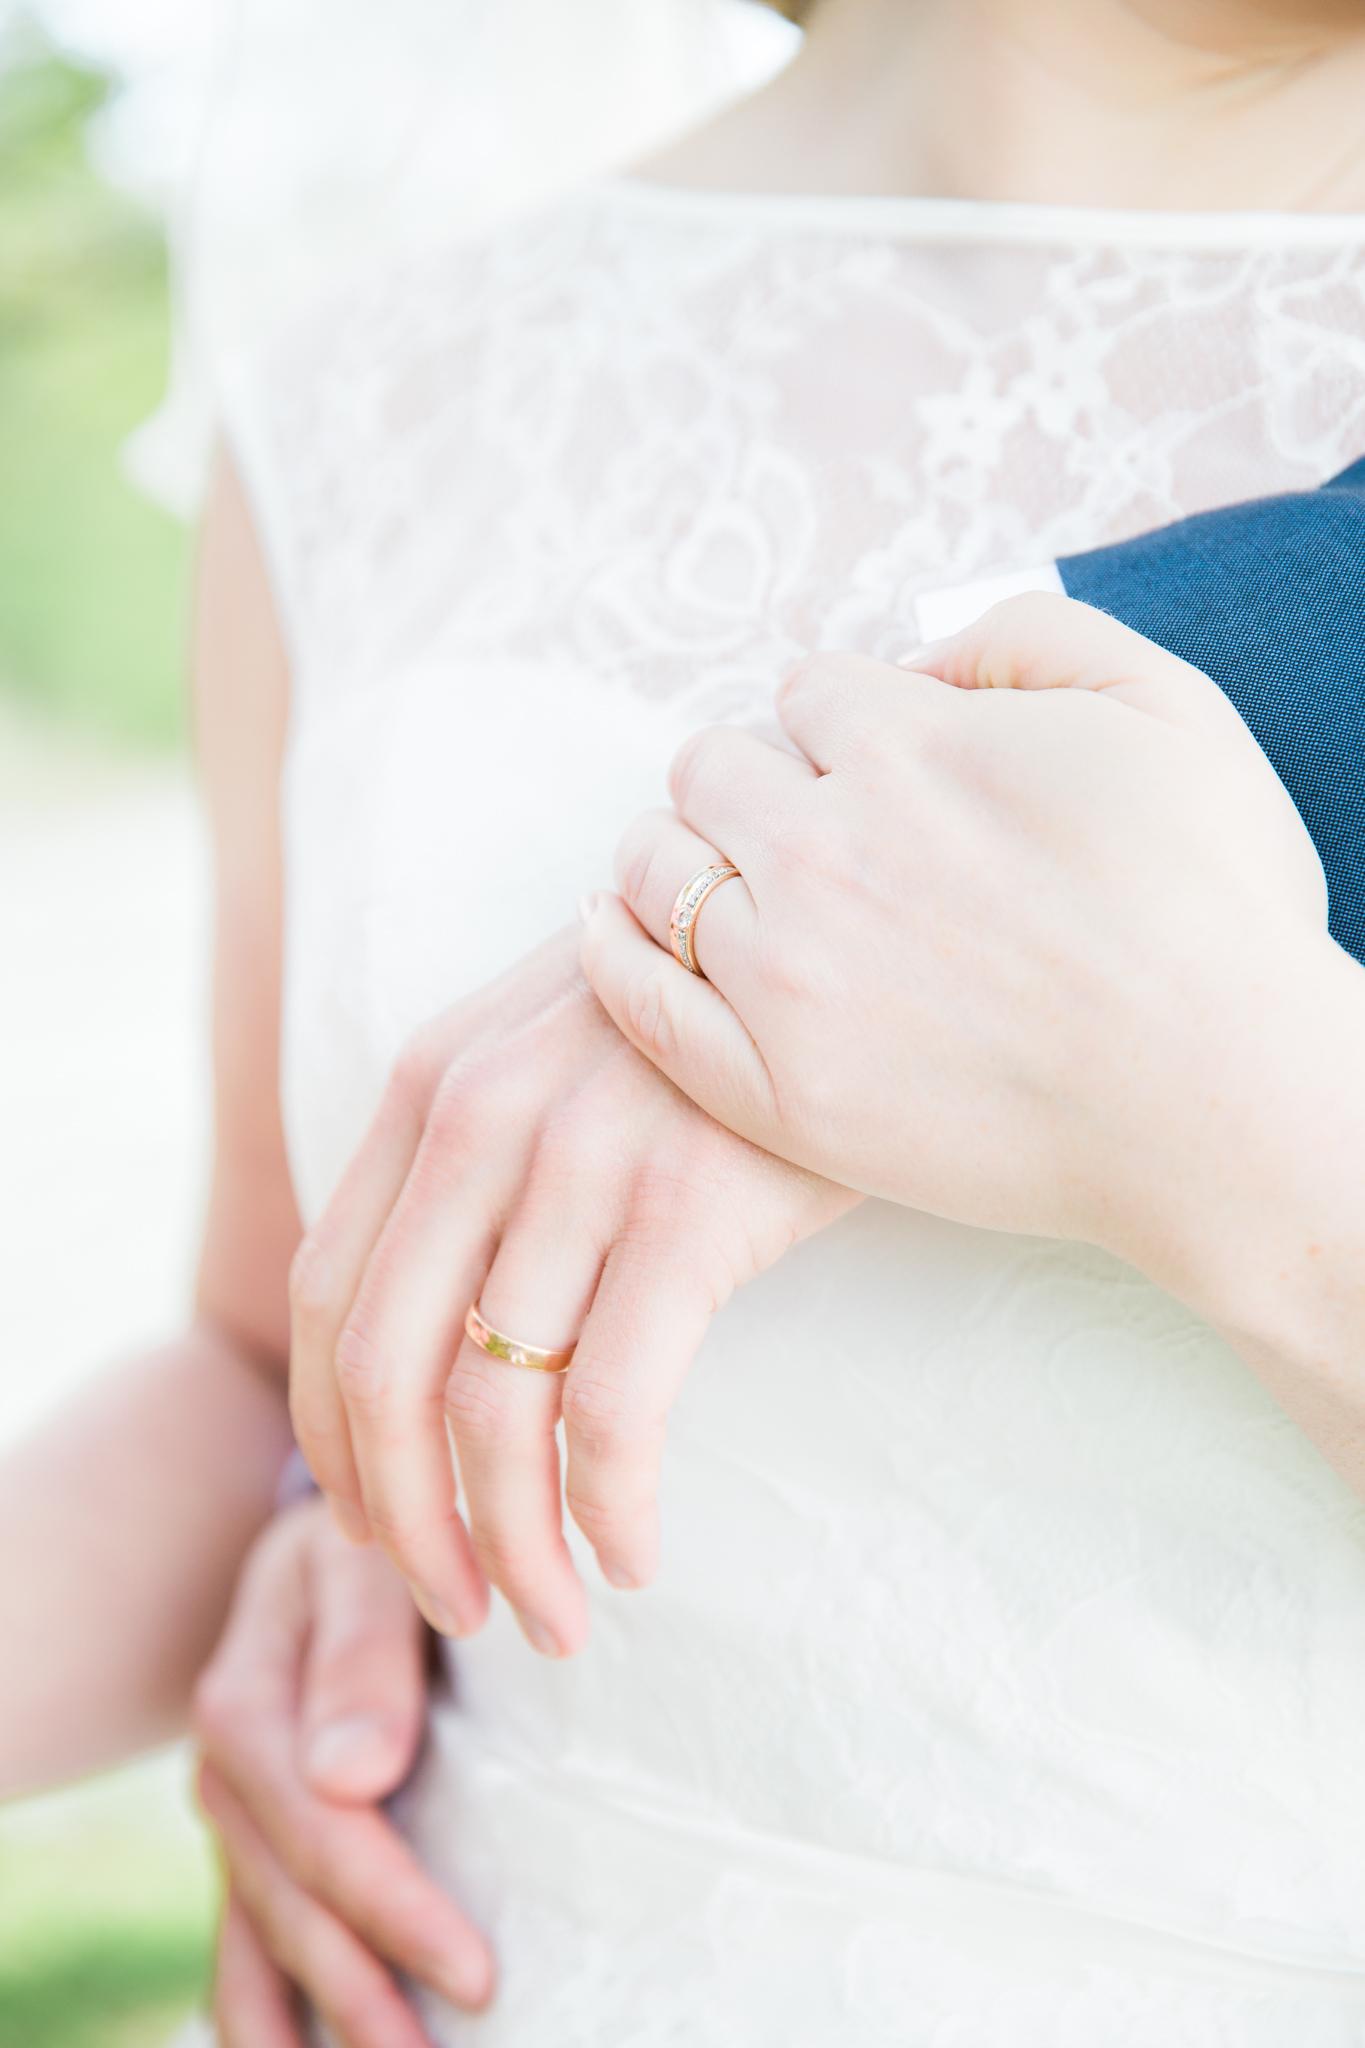 ViOli Photography bröllopsfotograf-Karlshamn-Blekinge-Ronneby-Karlskrona-Sölvesborg-Bromölla-Kristianstad (16 av 35)